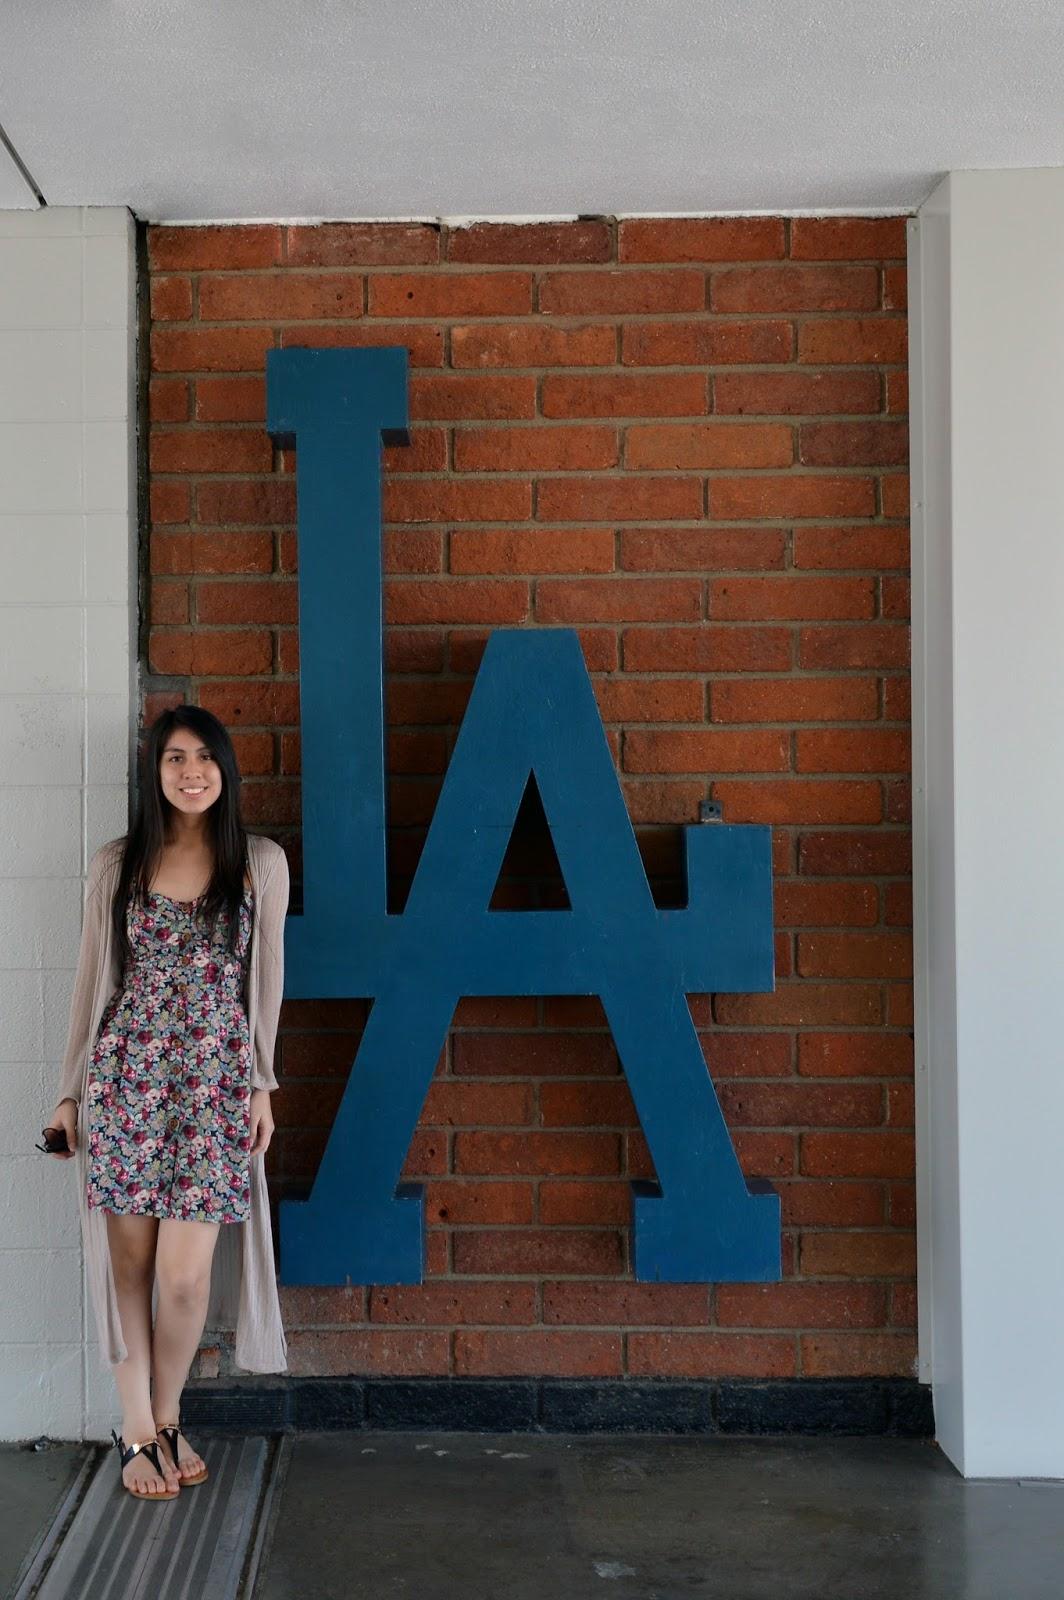 silvia-armas-usa-diary-trip-sunset-travel-fashion-blogger-ecuador-latina-las-vegas-los-angeles-texas-california-style-landscapes-family